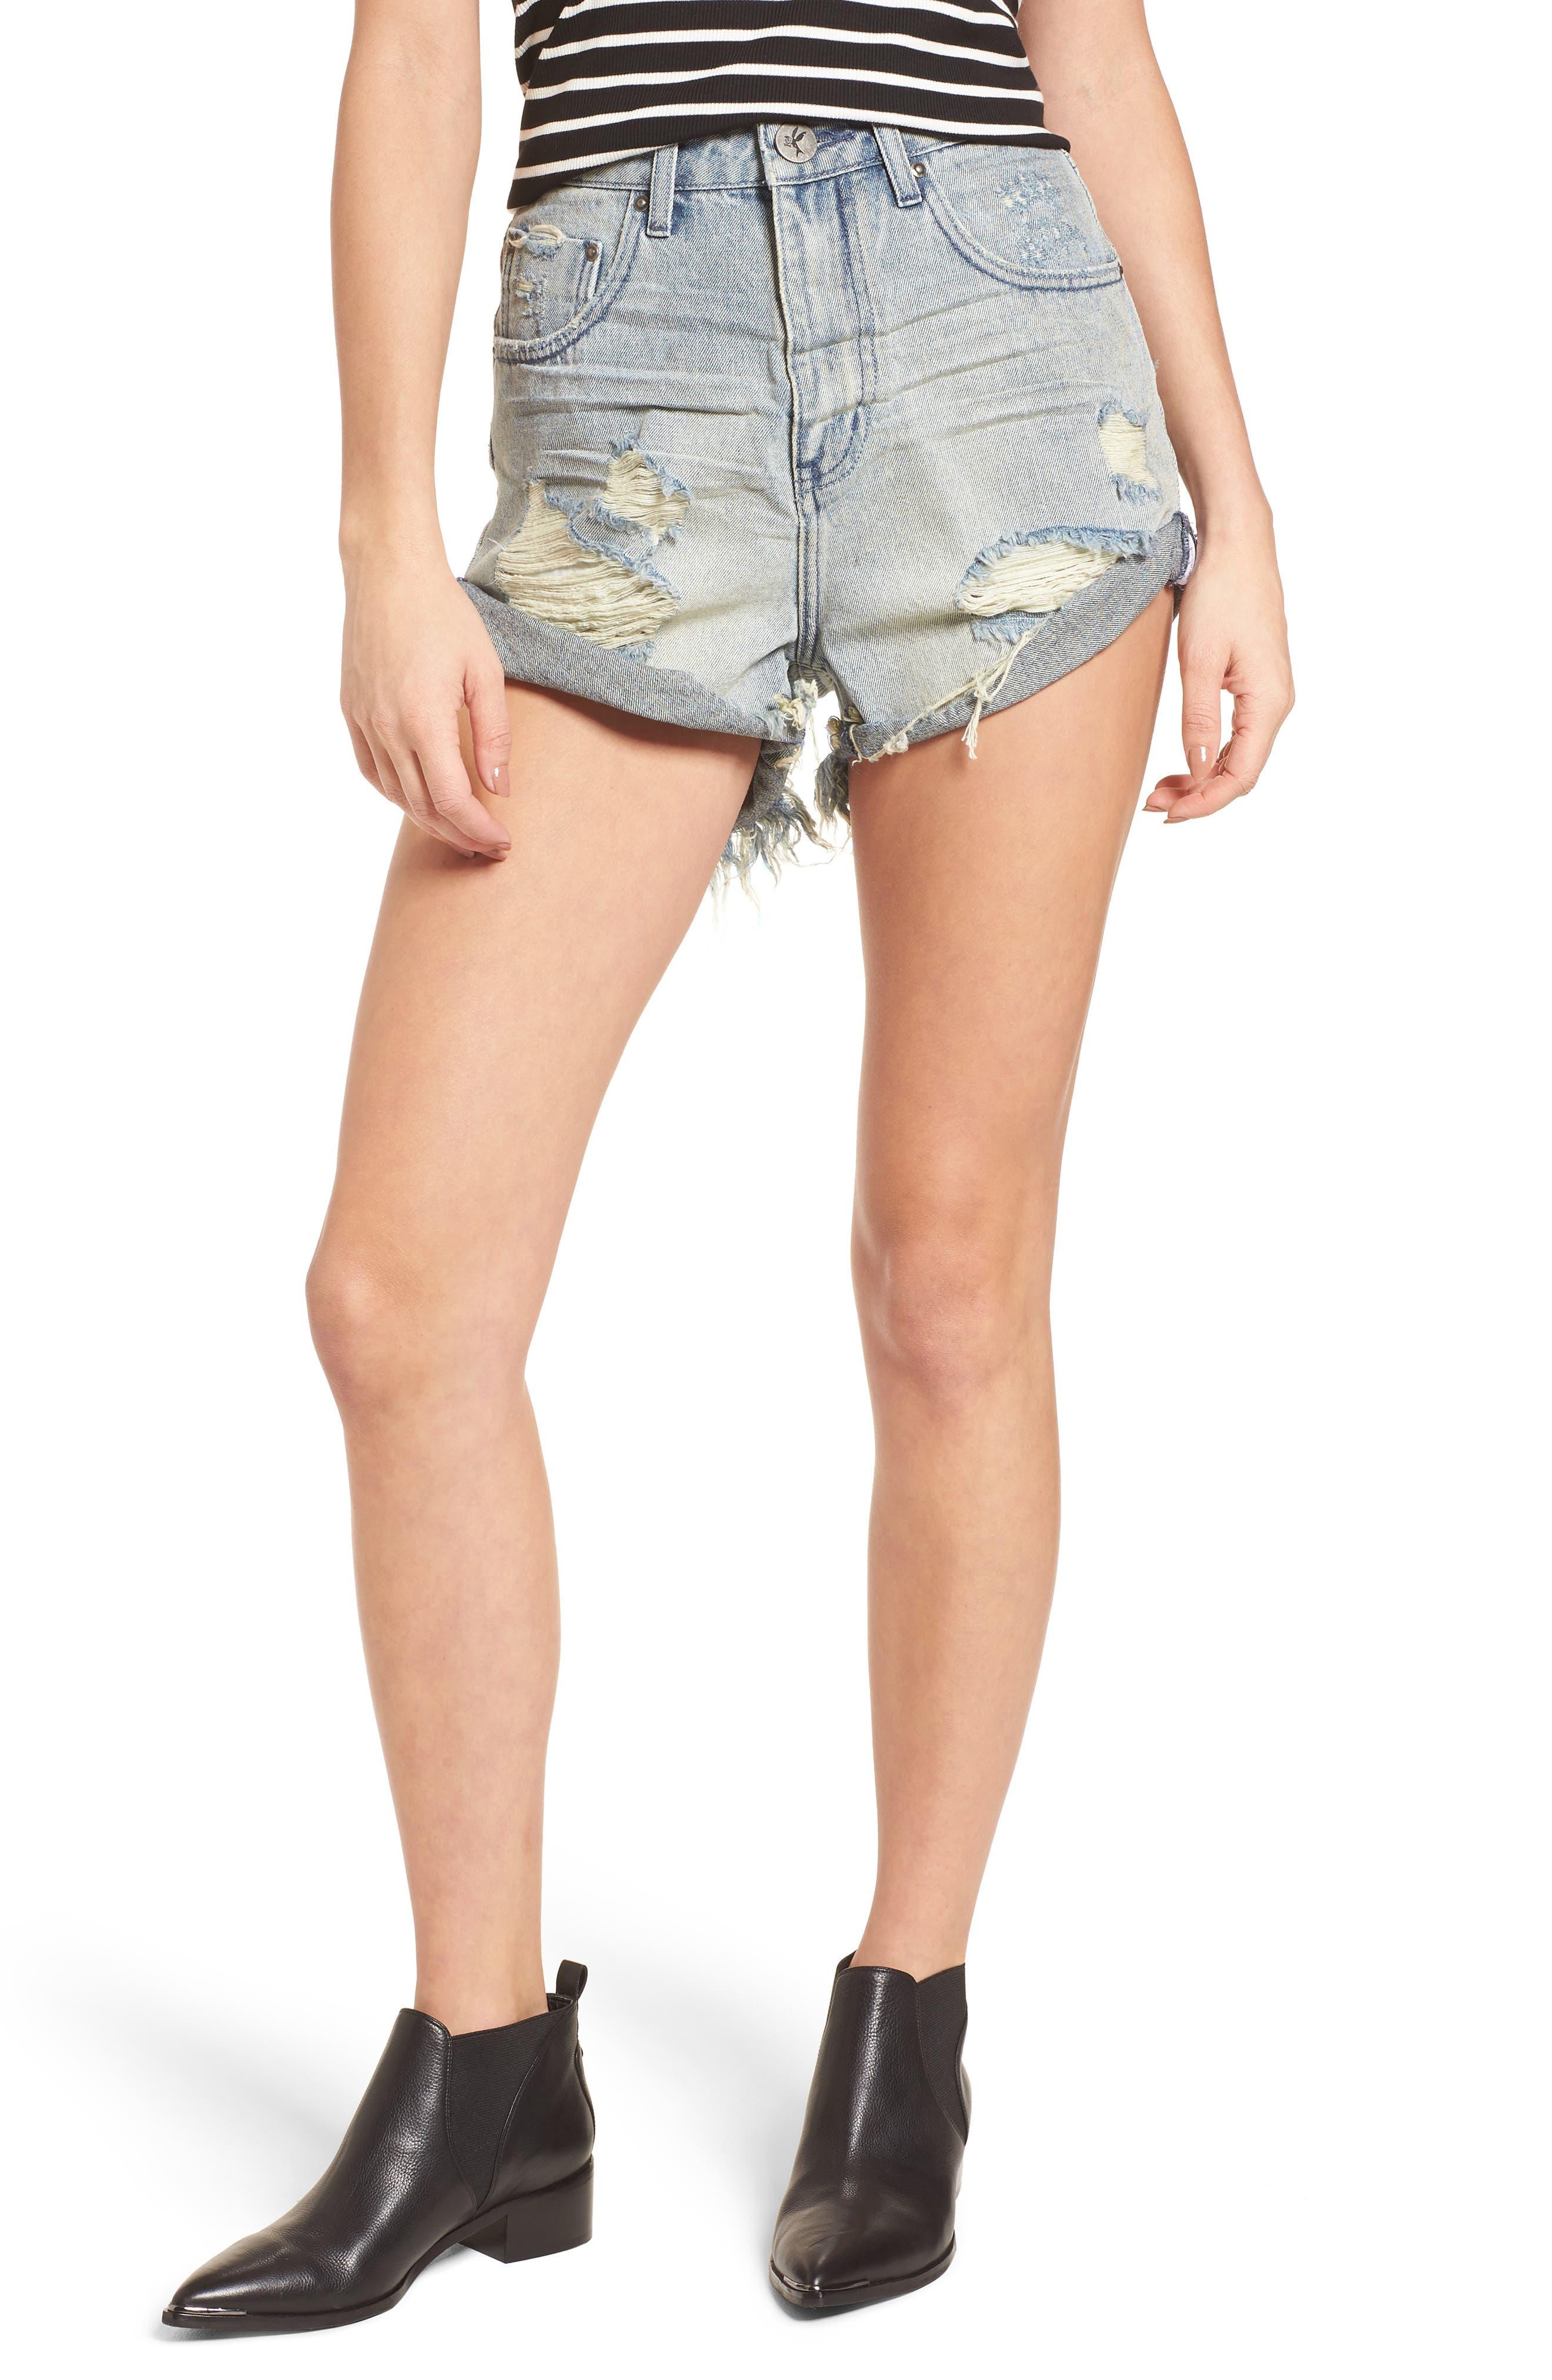 Bandit Ripped High Waist Jean Shorts,                         Main,                         color, 488